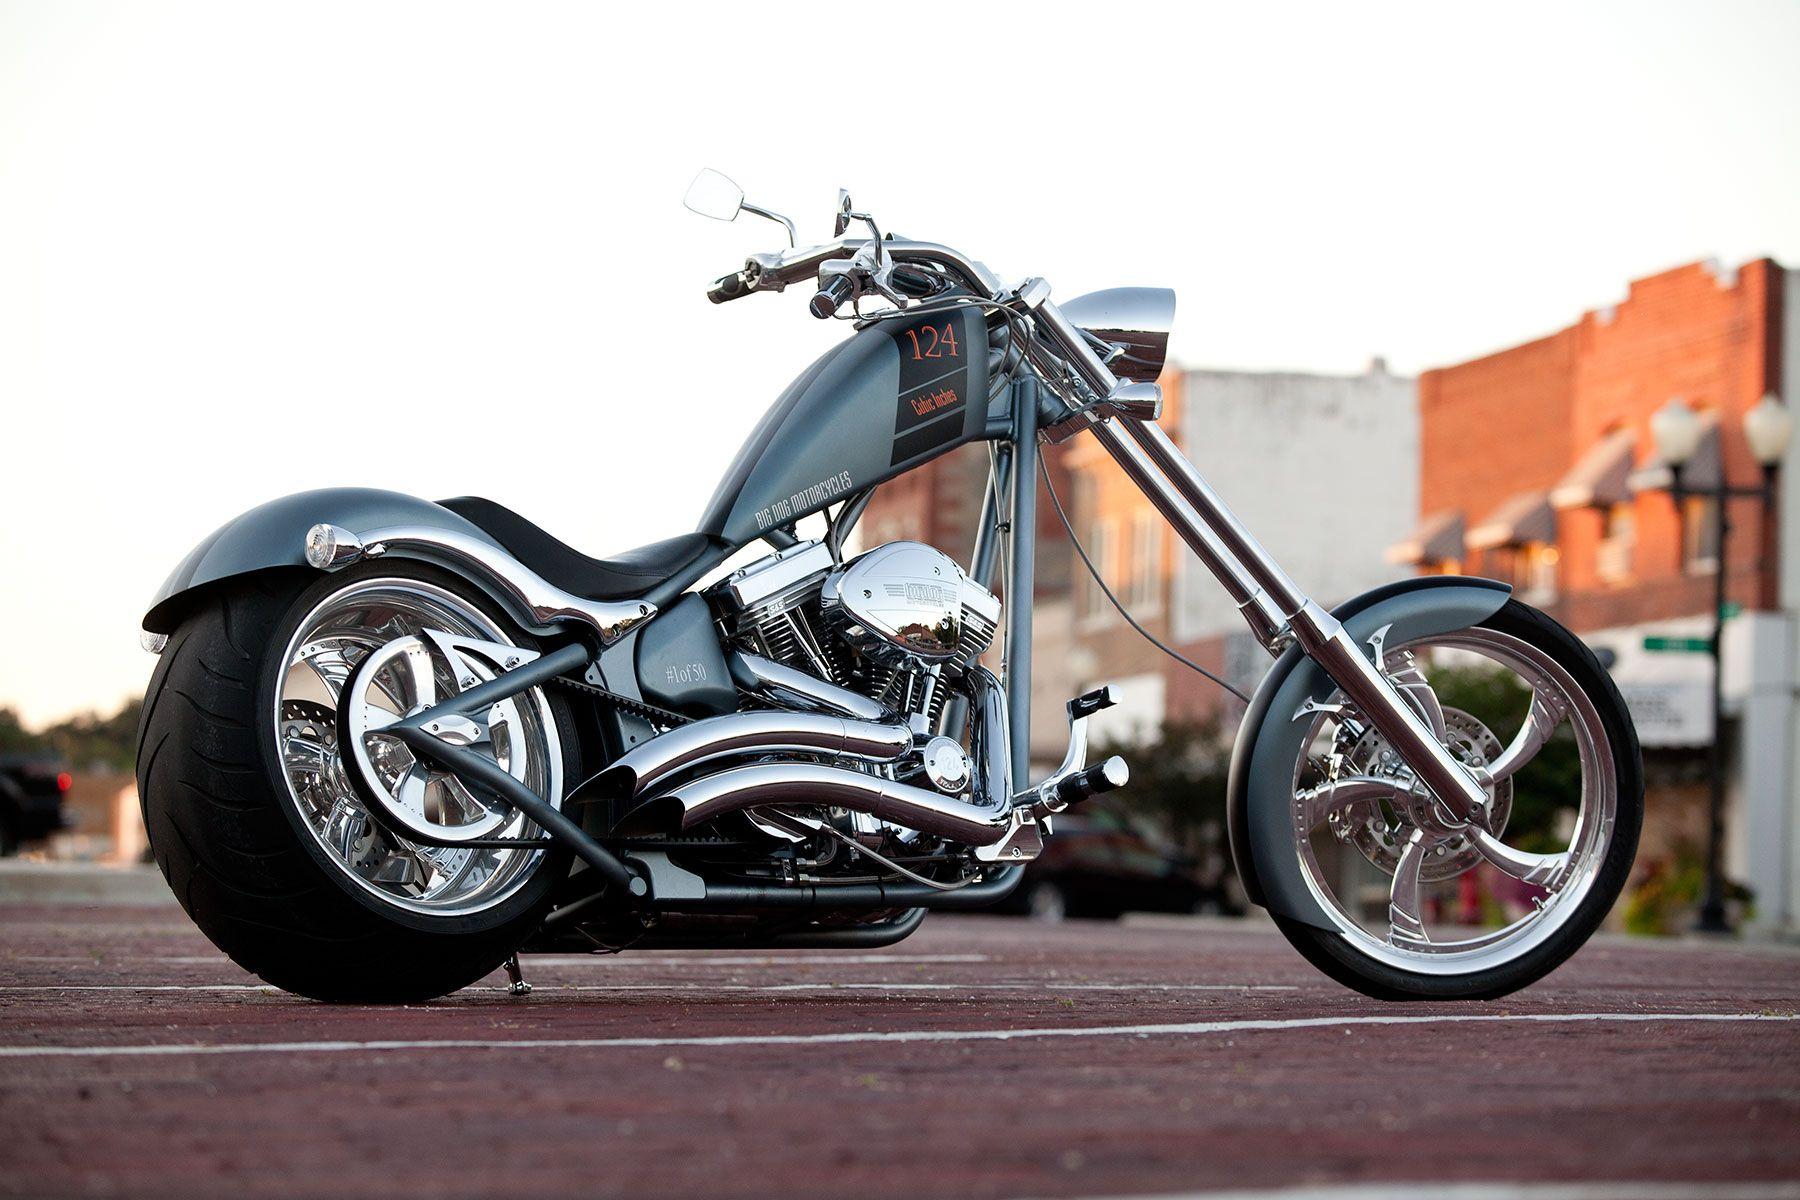 Big Dog Motorcycles Recalling 2004 Models